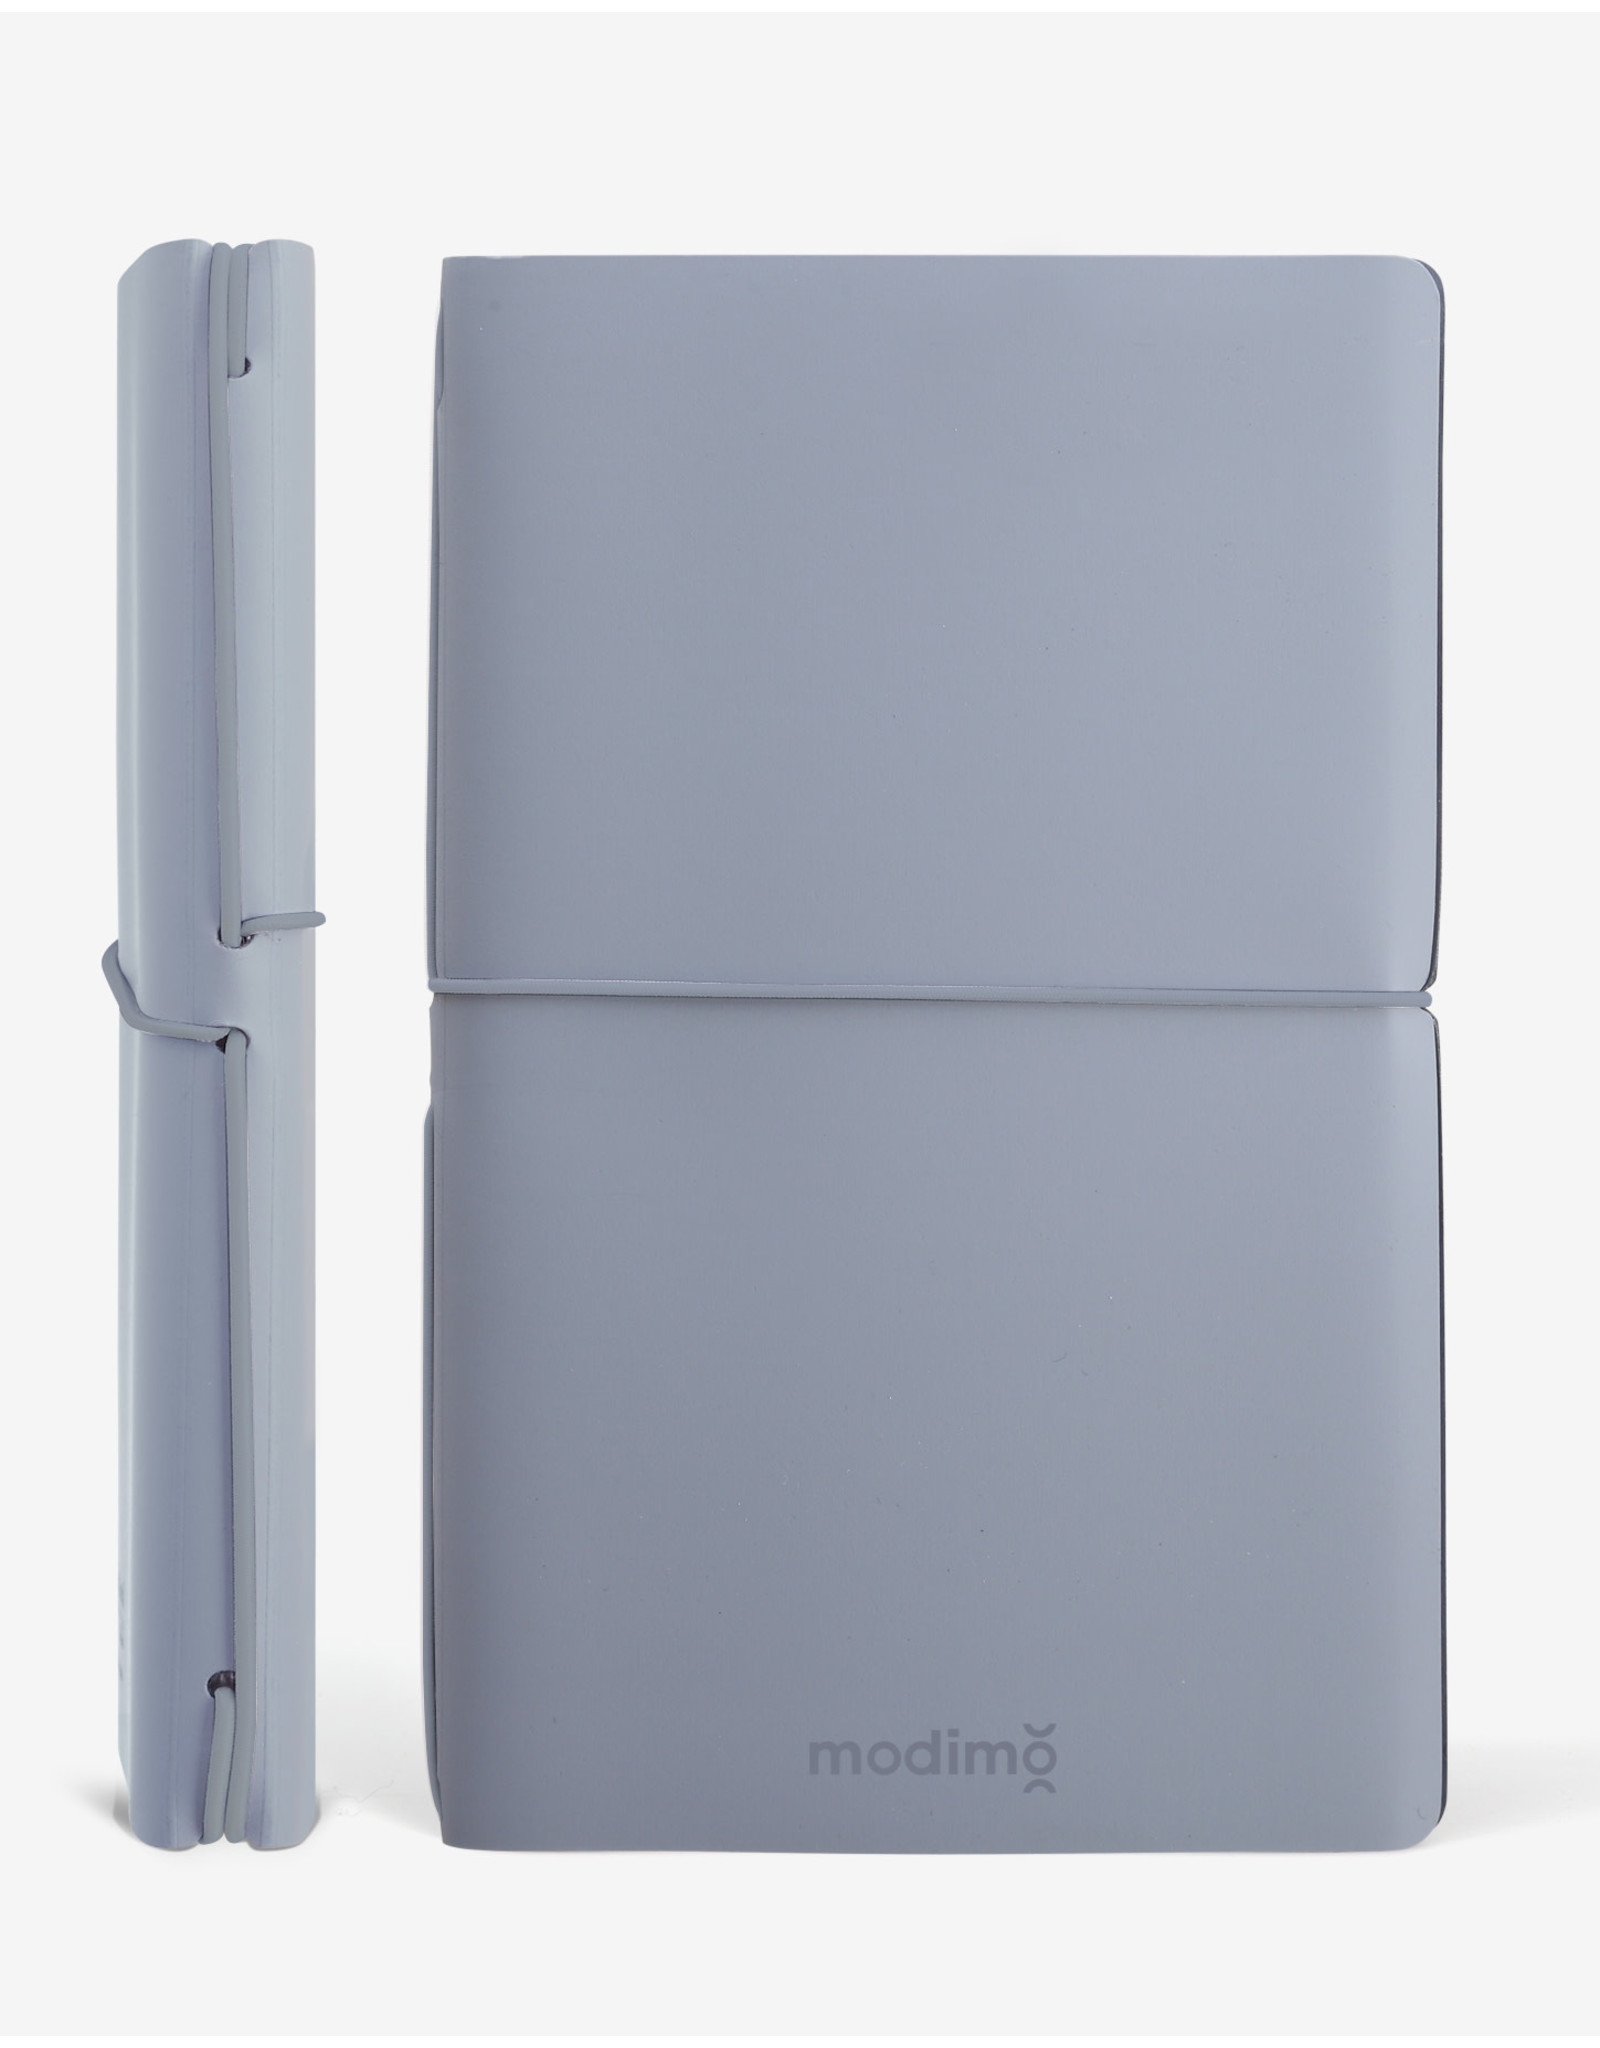 Modimo Bullet journal Light blue - My plan - White - 10 x 15 cm - Flexible regenerated leather